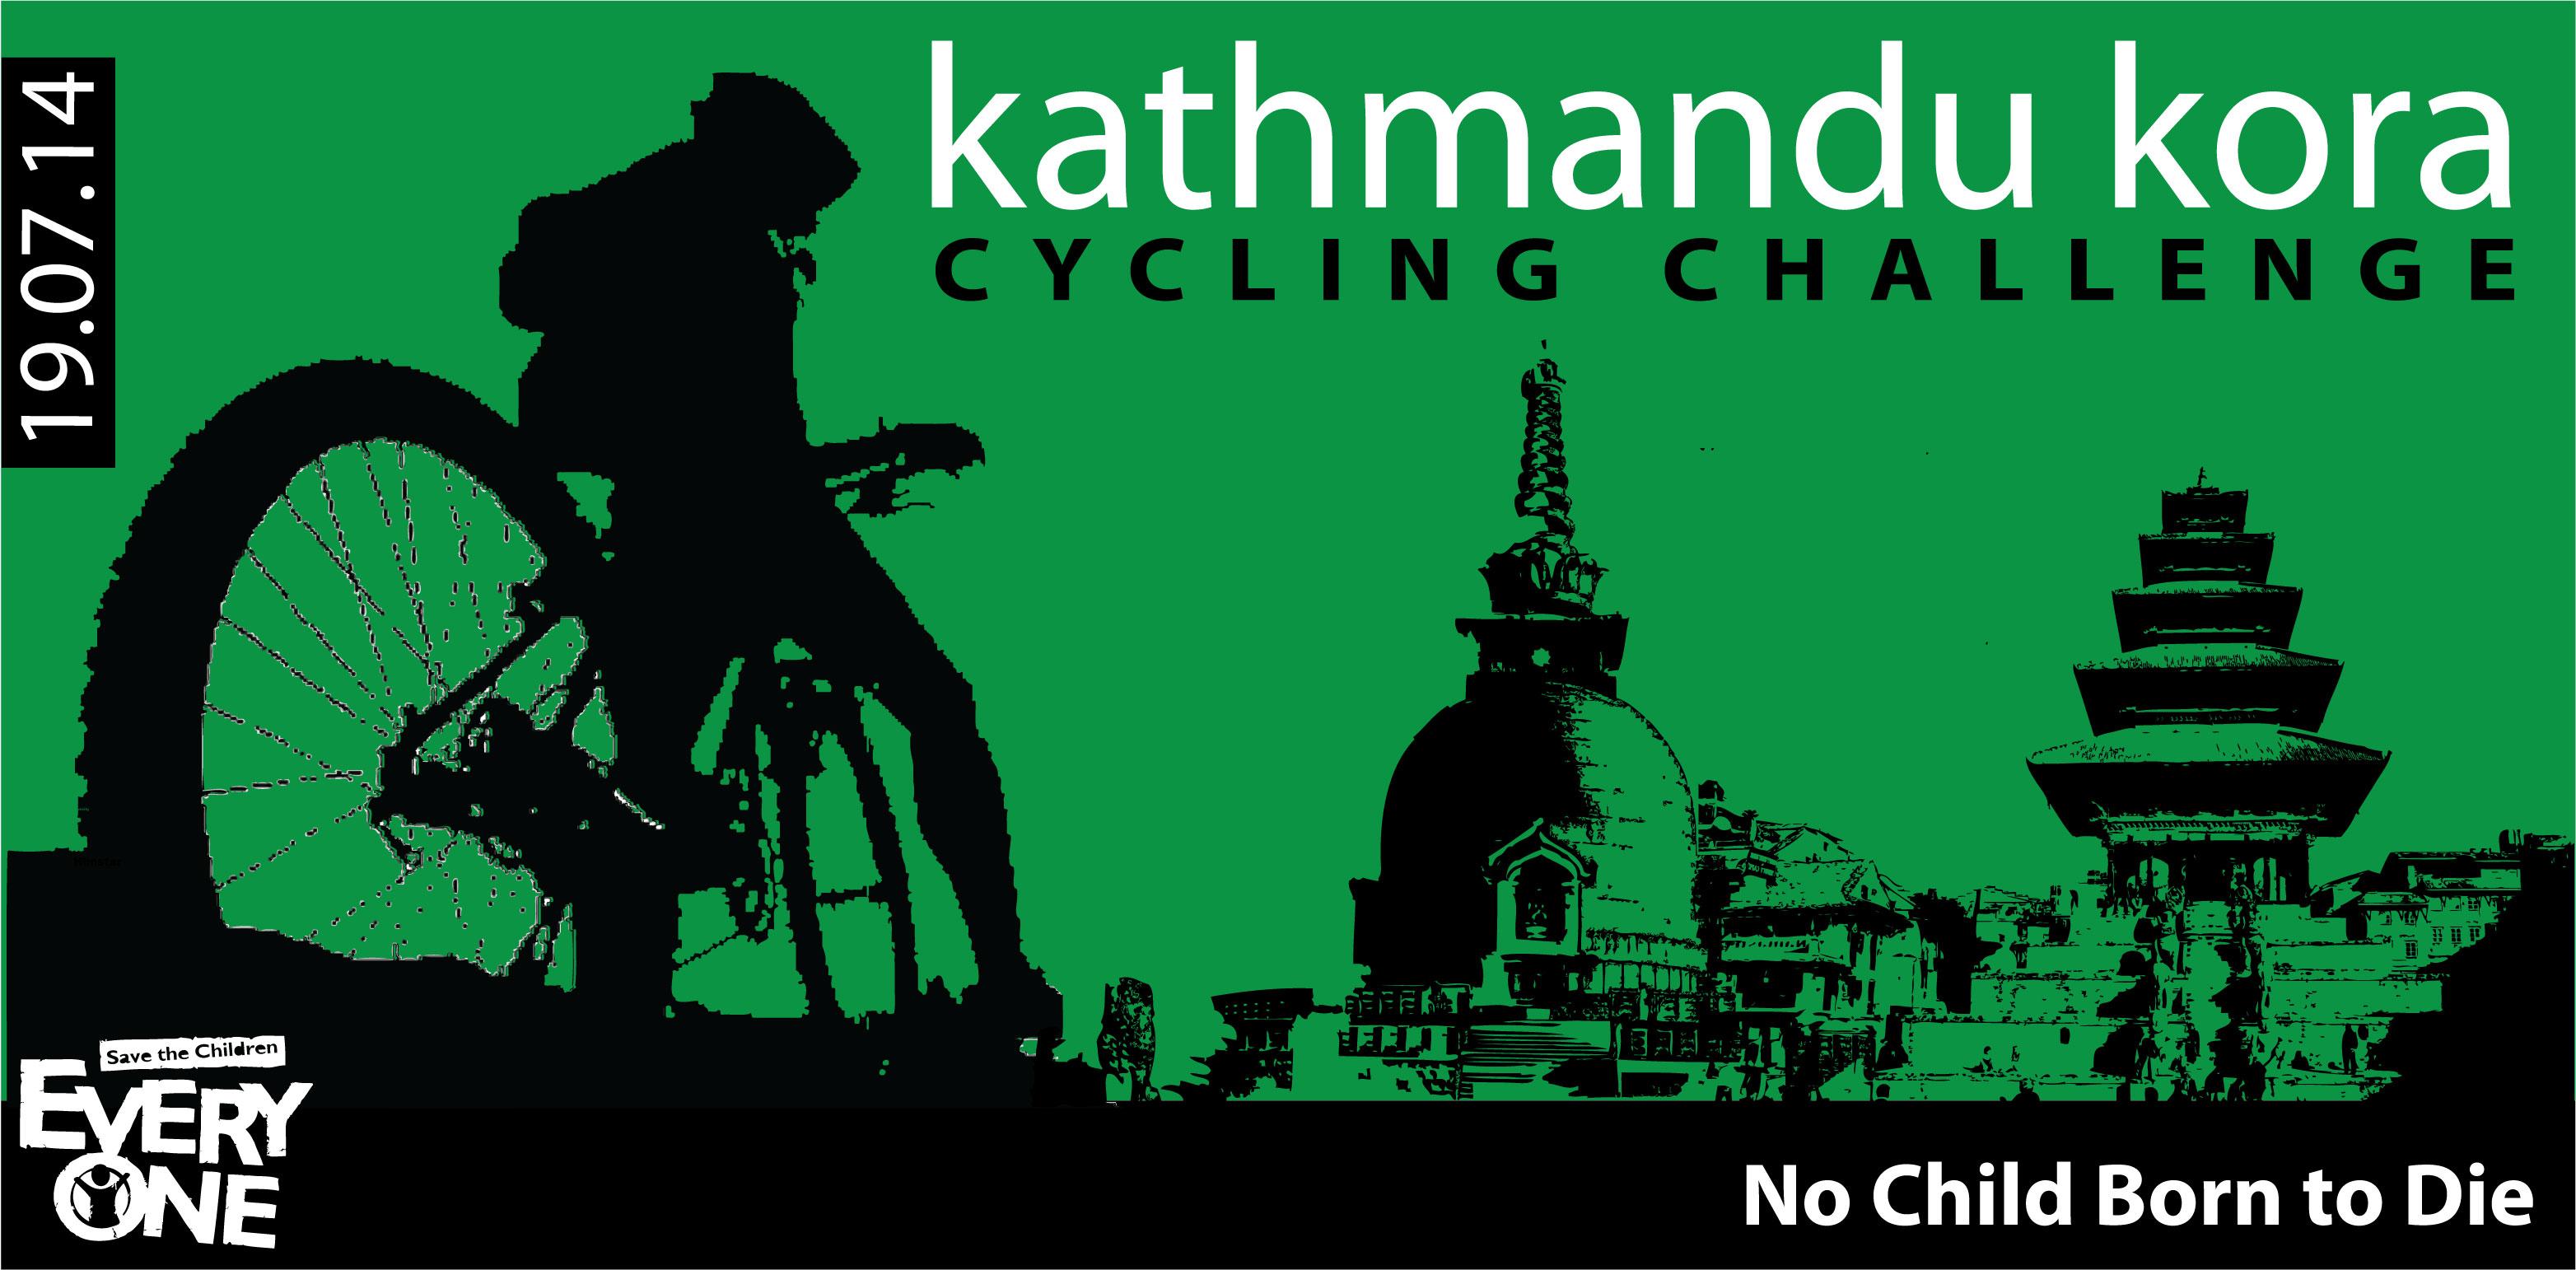 Kathmandu Kora Cycling Challenge 2014